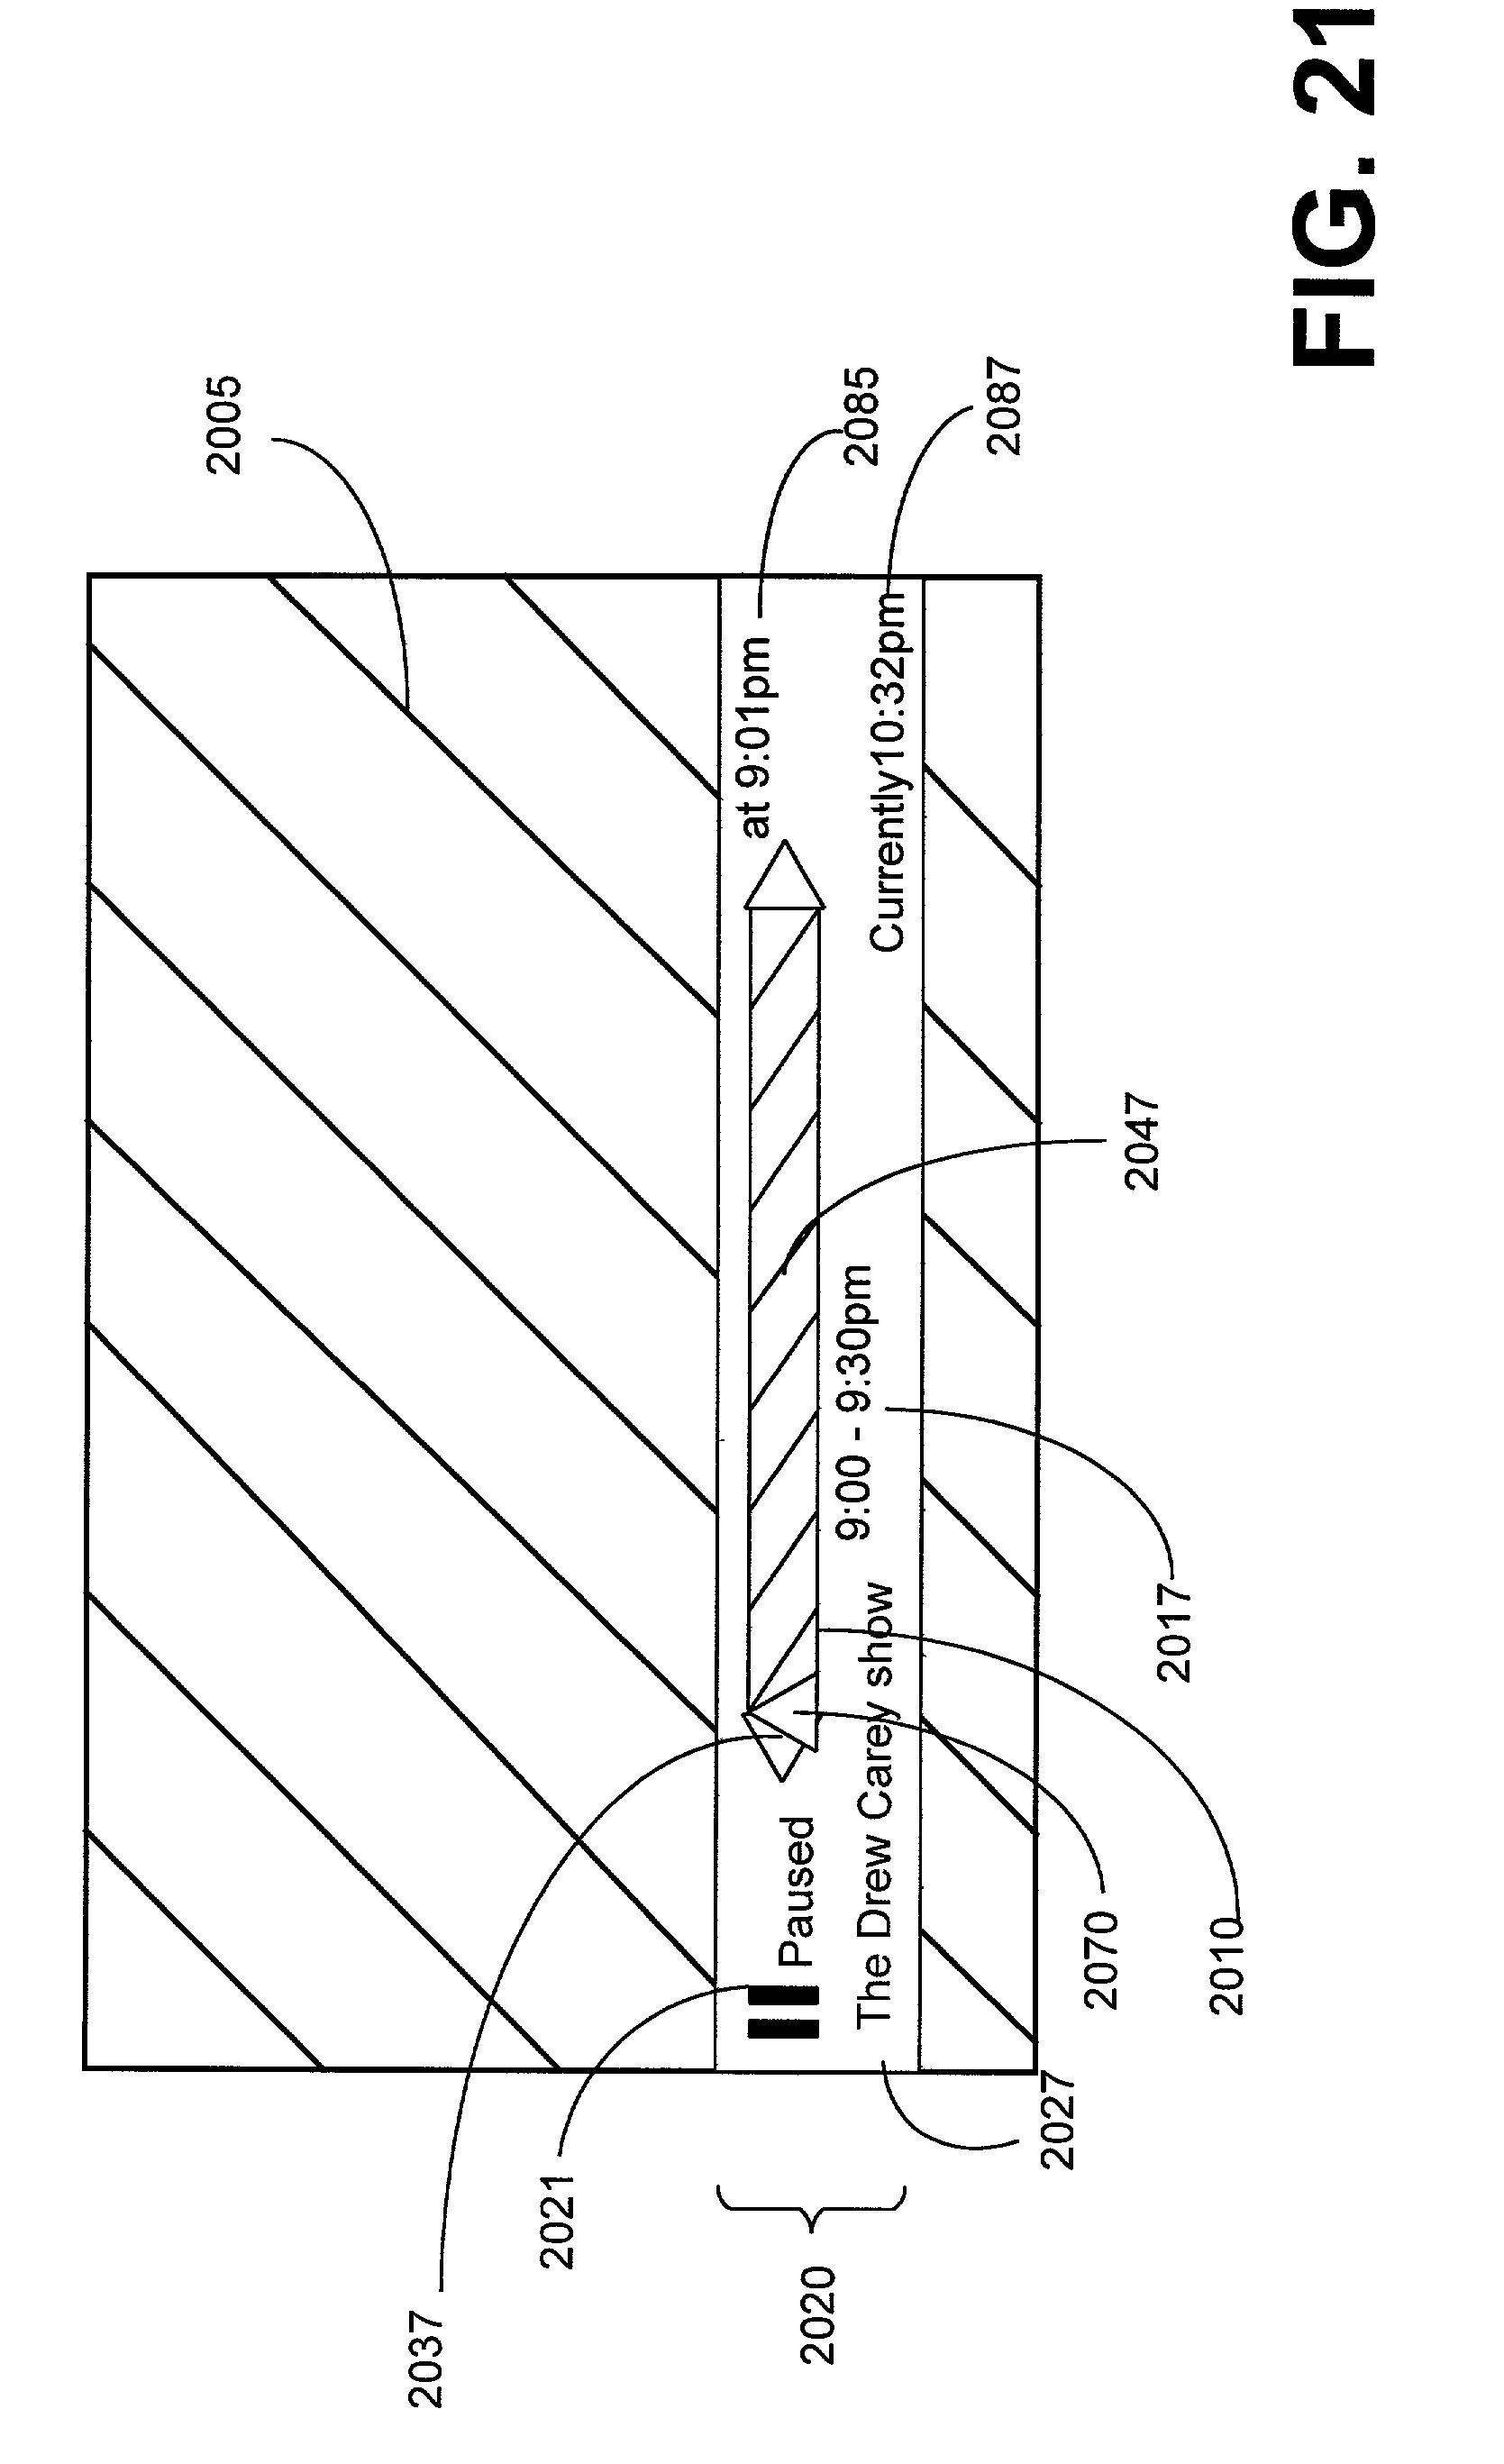 38778 wiring block diagram 38778 wiring diagrams patent drawing wiring block diagram